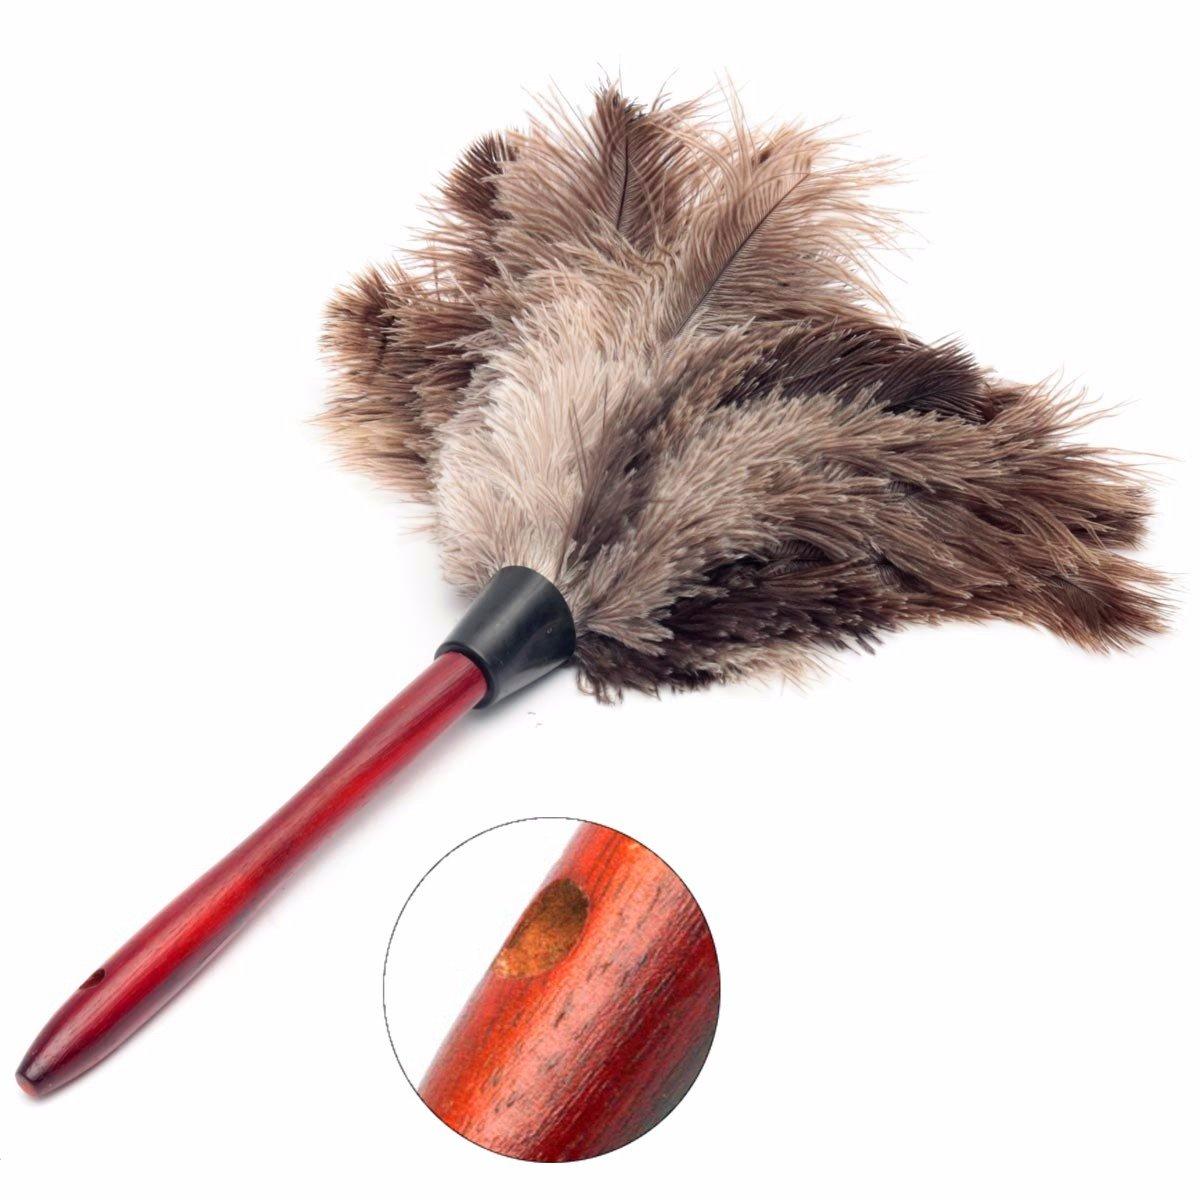 20cm Ostrich Feather Home Cleaning Duster Brush Wood Handle Anti-static Natural Grey Fur // Manejar 20cm pluma de avestruz madera cepillo plumero de la limpieza del hogar antiestático piel gris